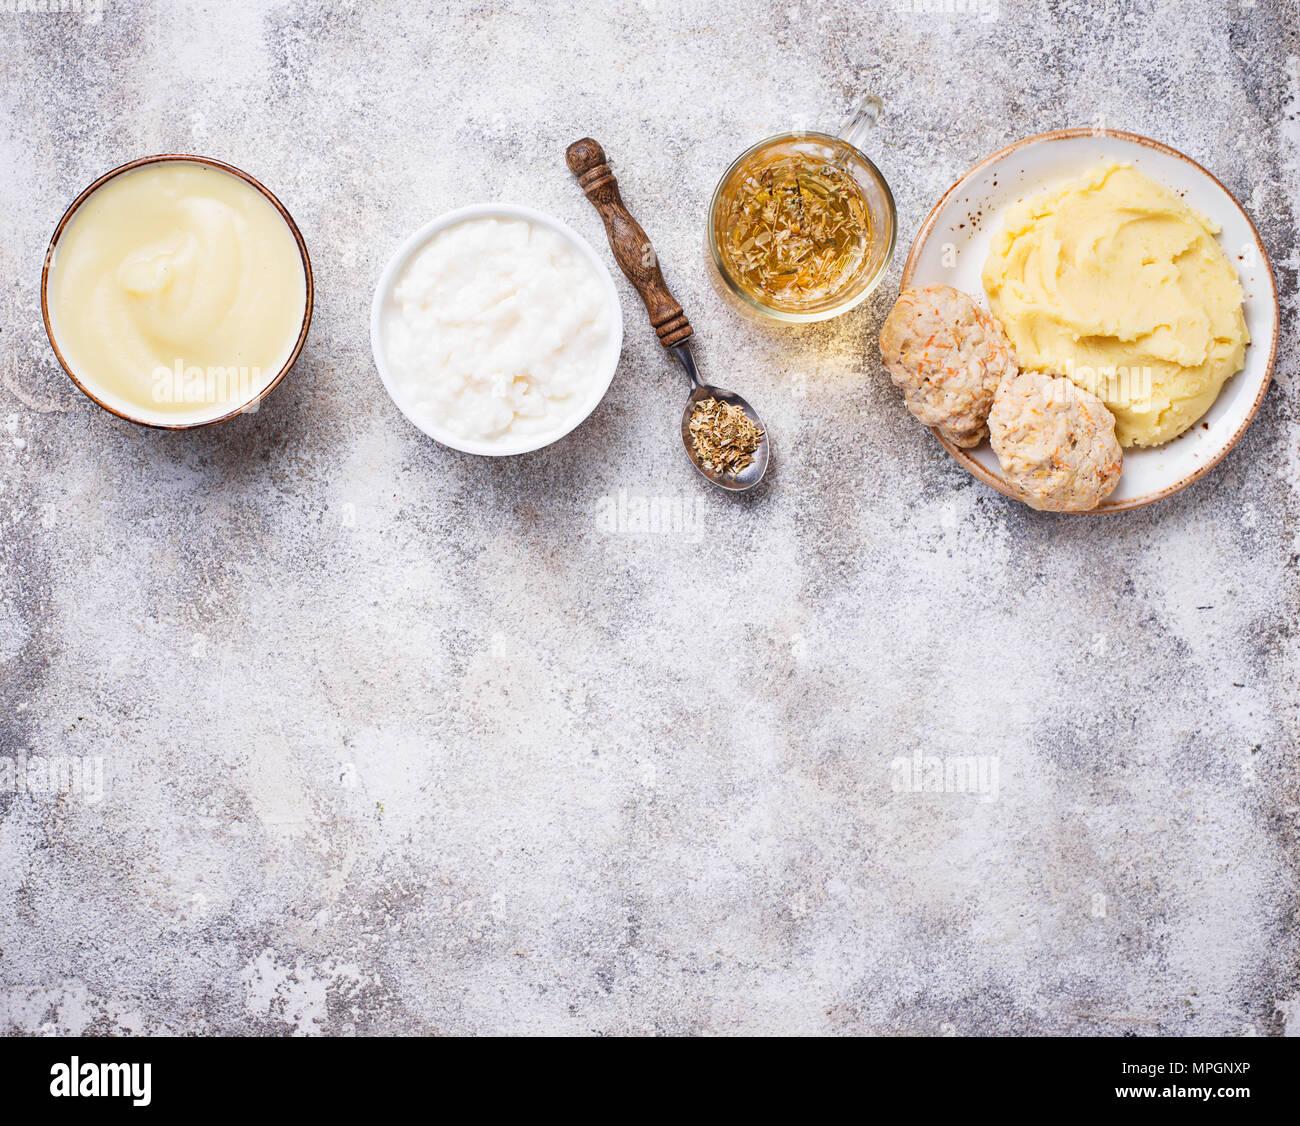 Gastrointestinal Tract Stockfotos & Gastrointestinal Tract Bilder ...